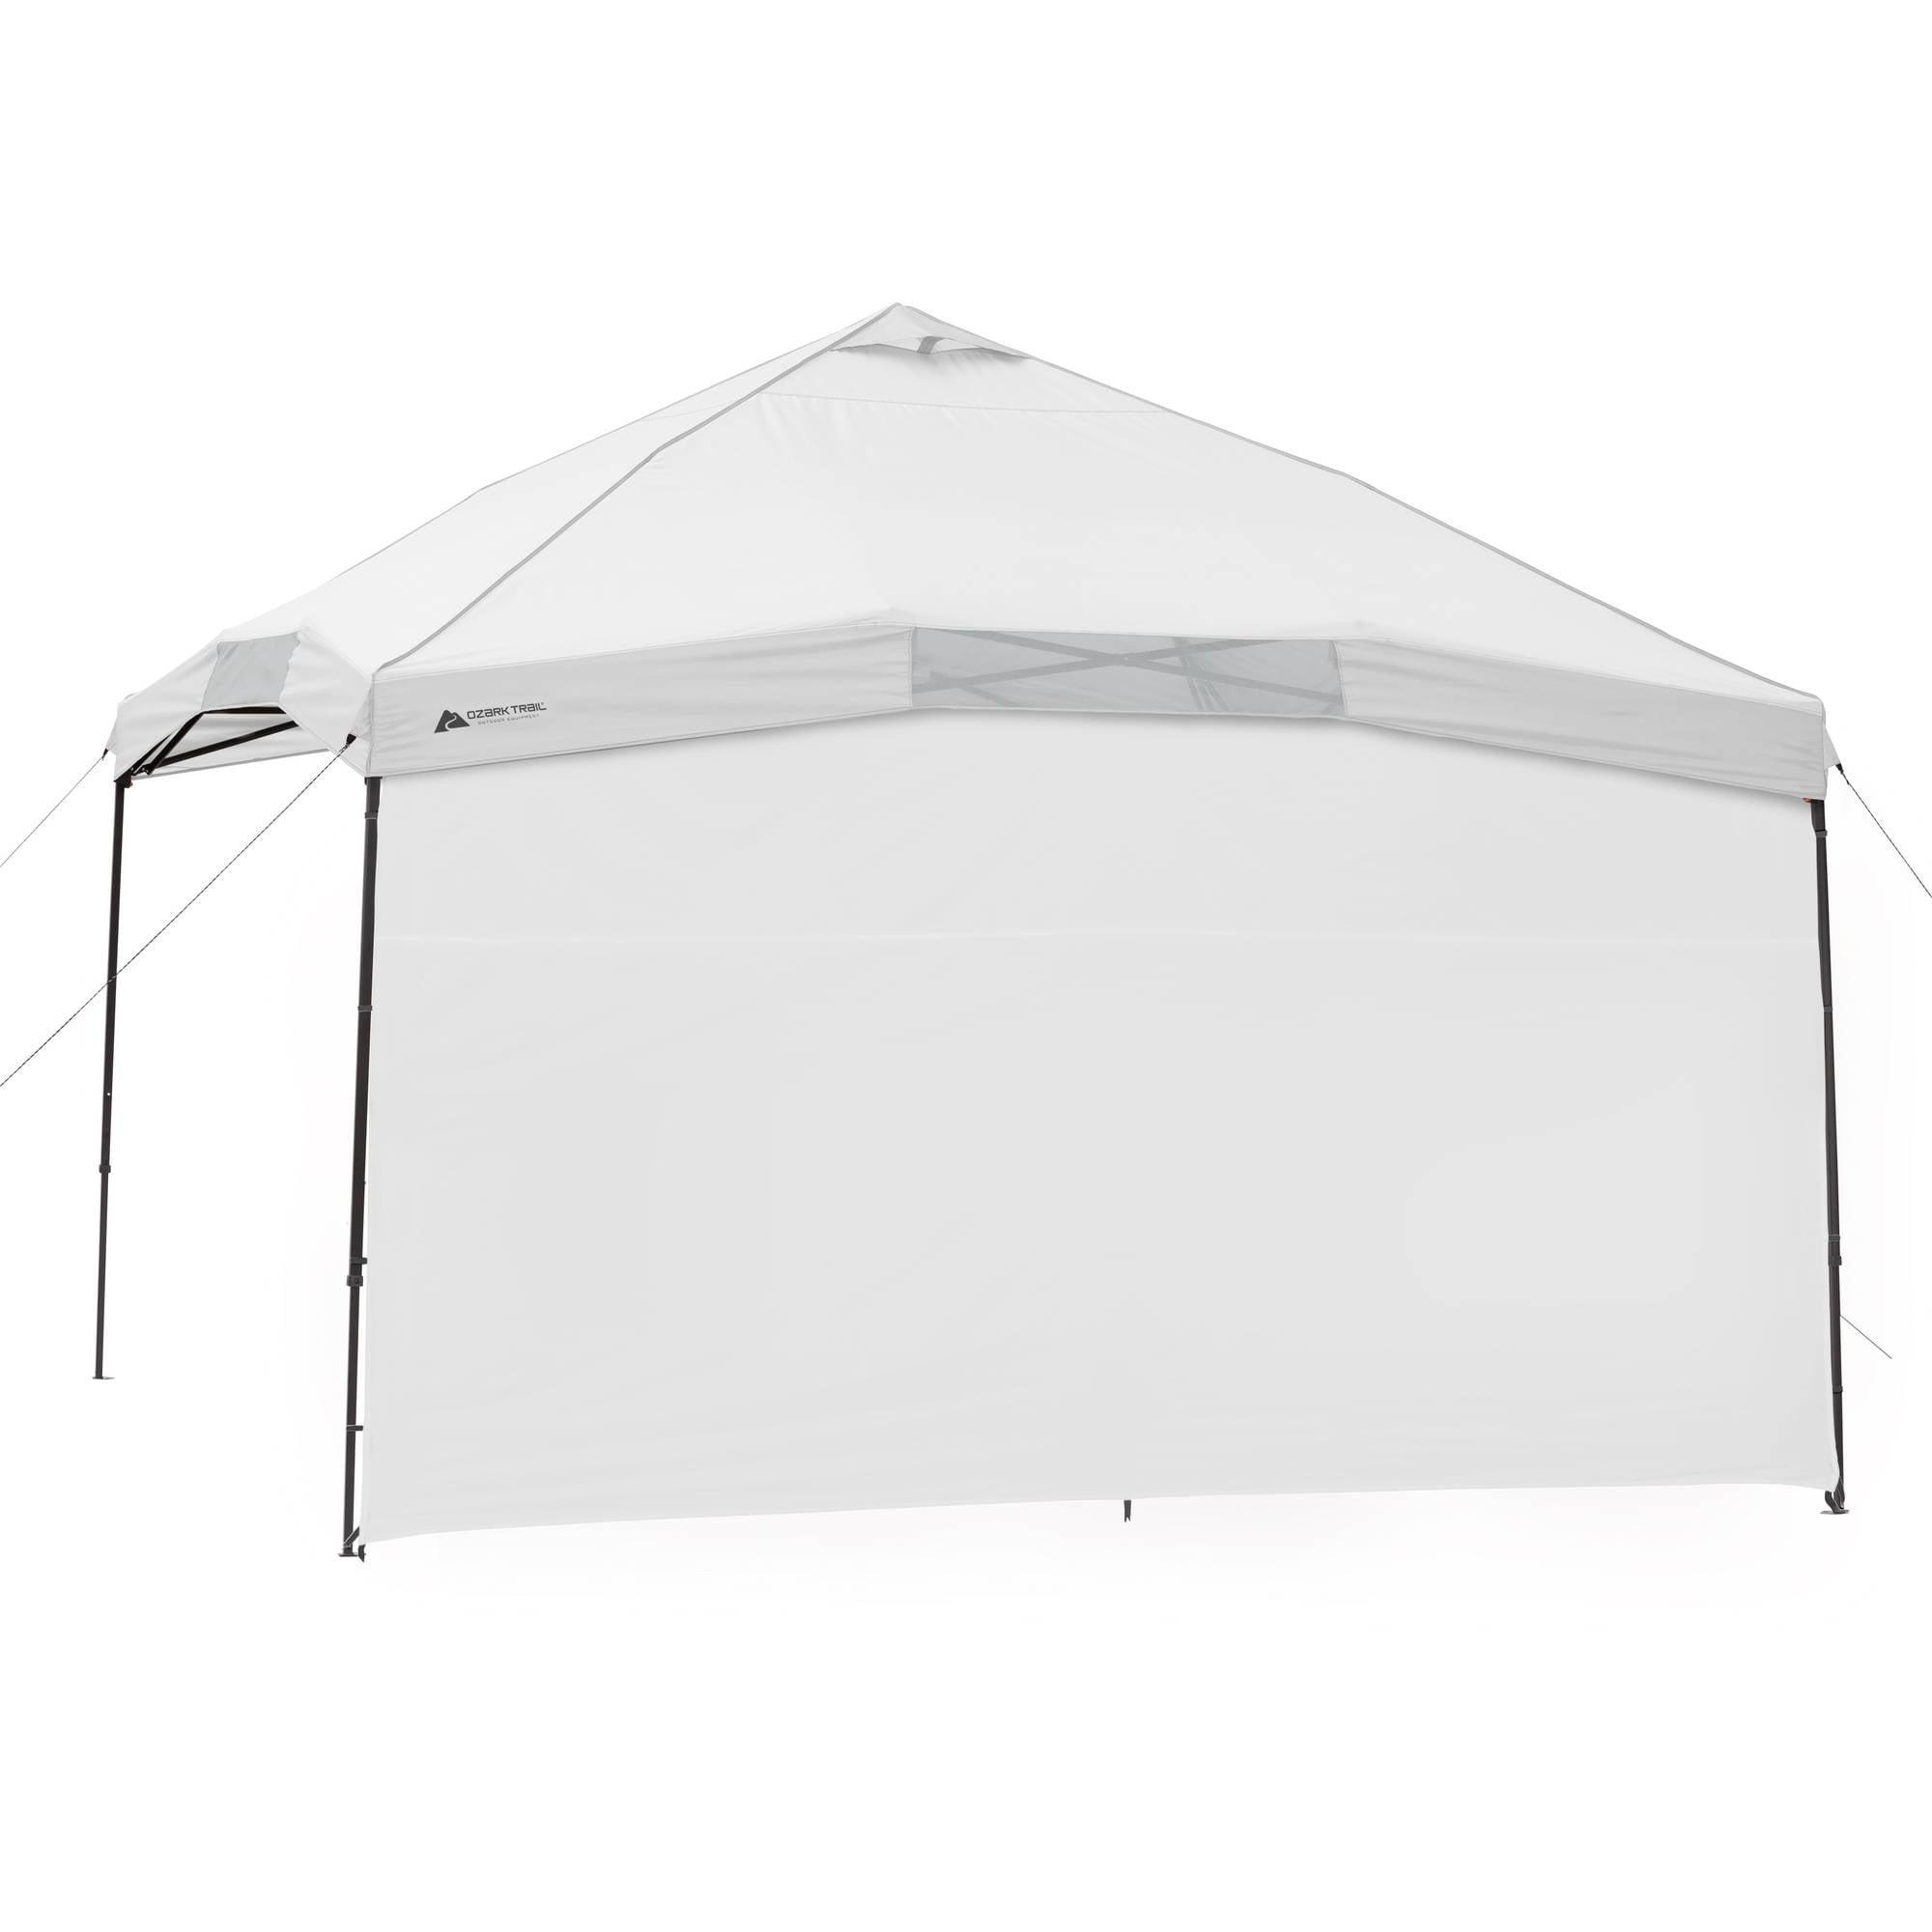 12u0027 X 12u0027 Gazebo Top Cover Patio Canopy Sun Wall Portable Outdoor Shad Ozark